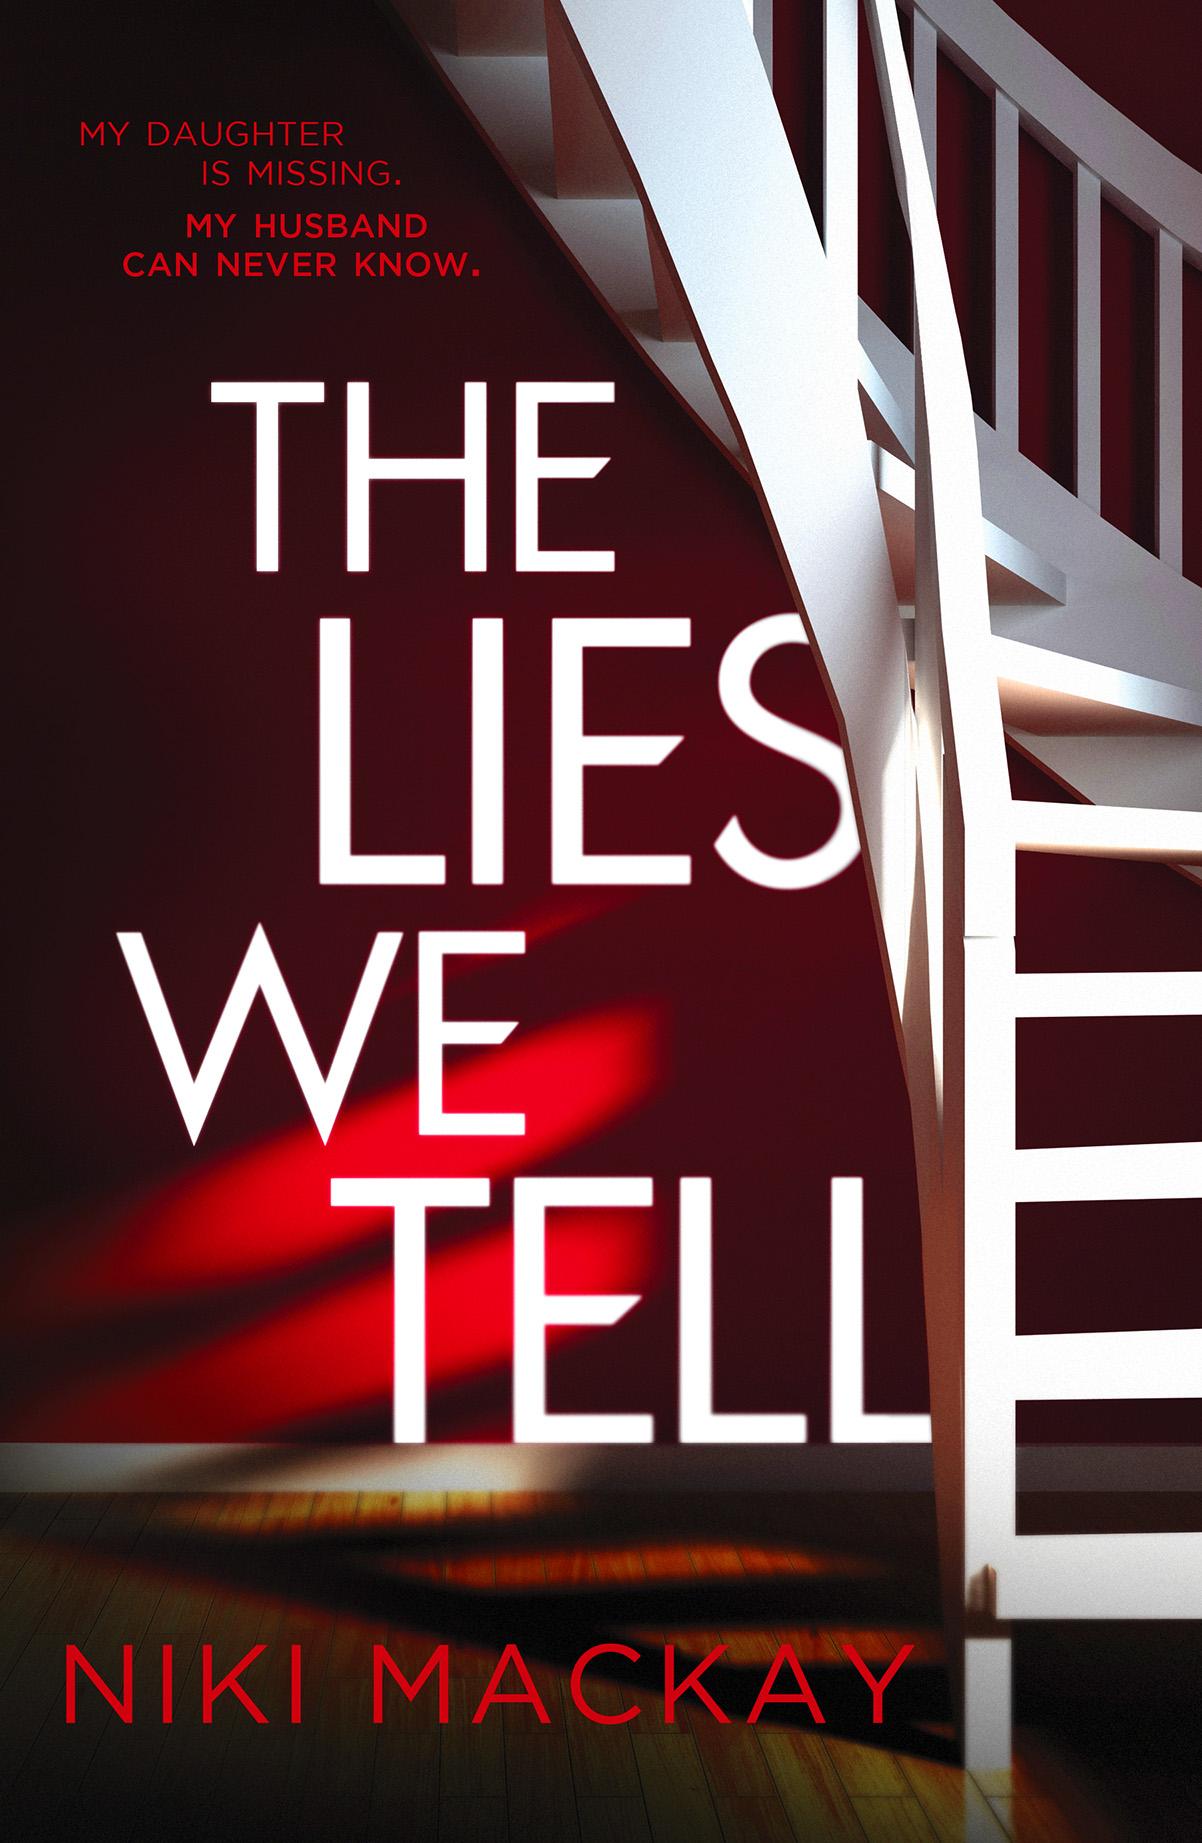 THE LIES WE TELL TPB.jpg